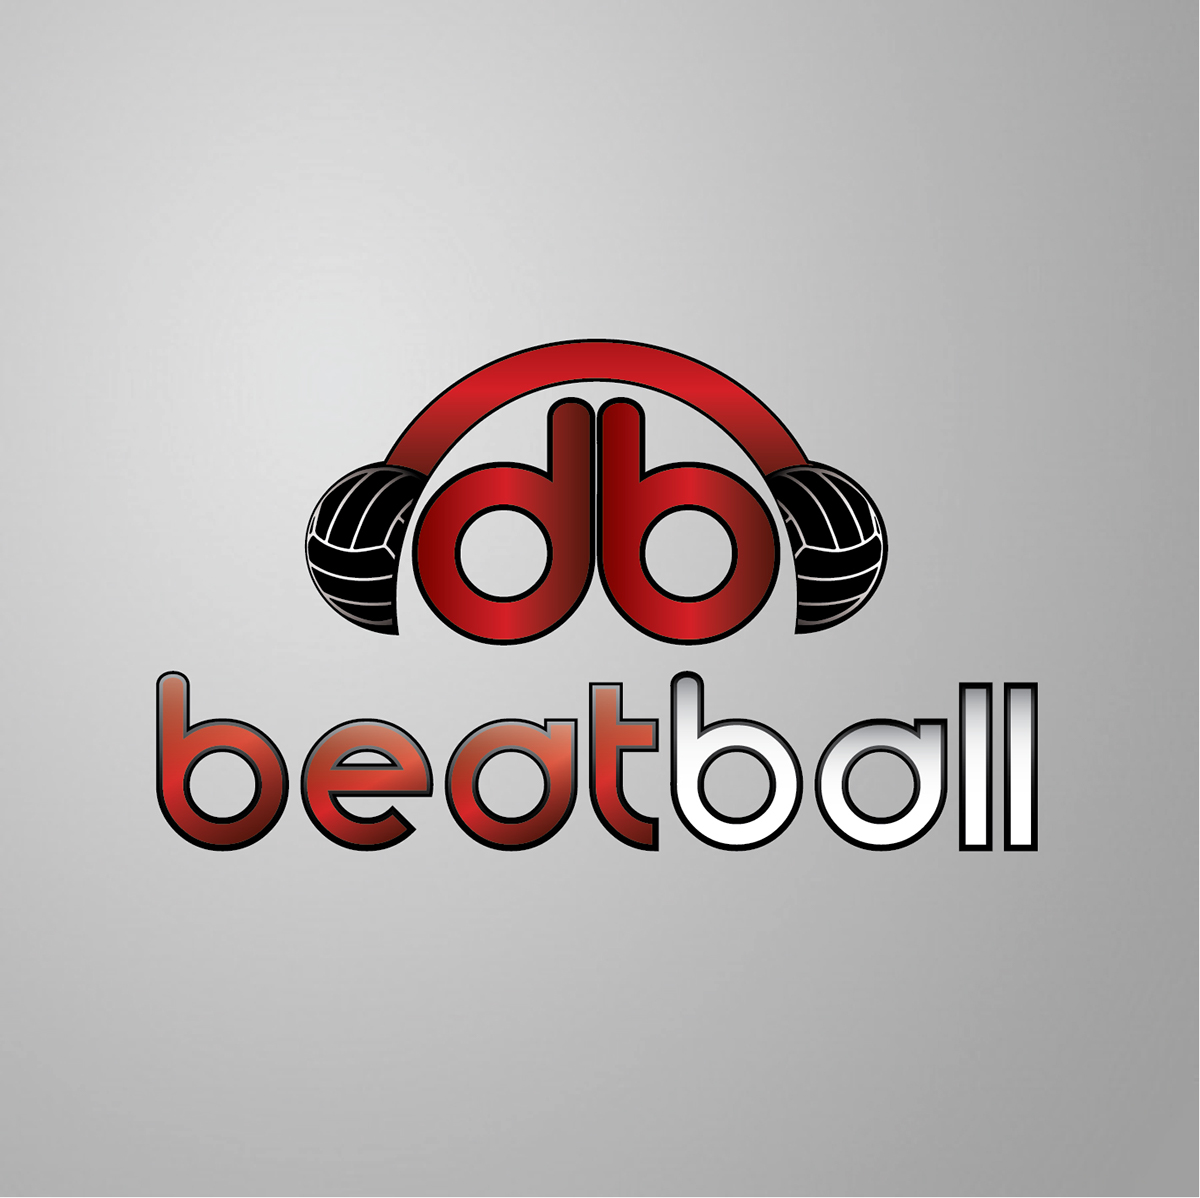 Beat ball game